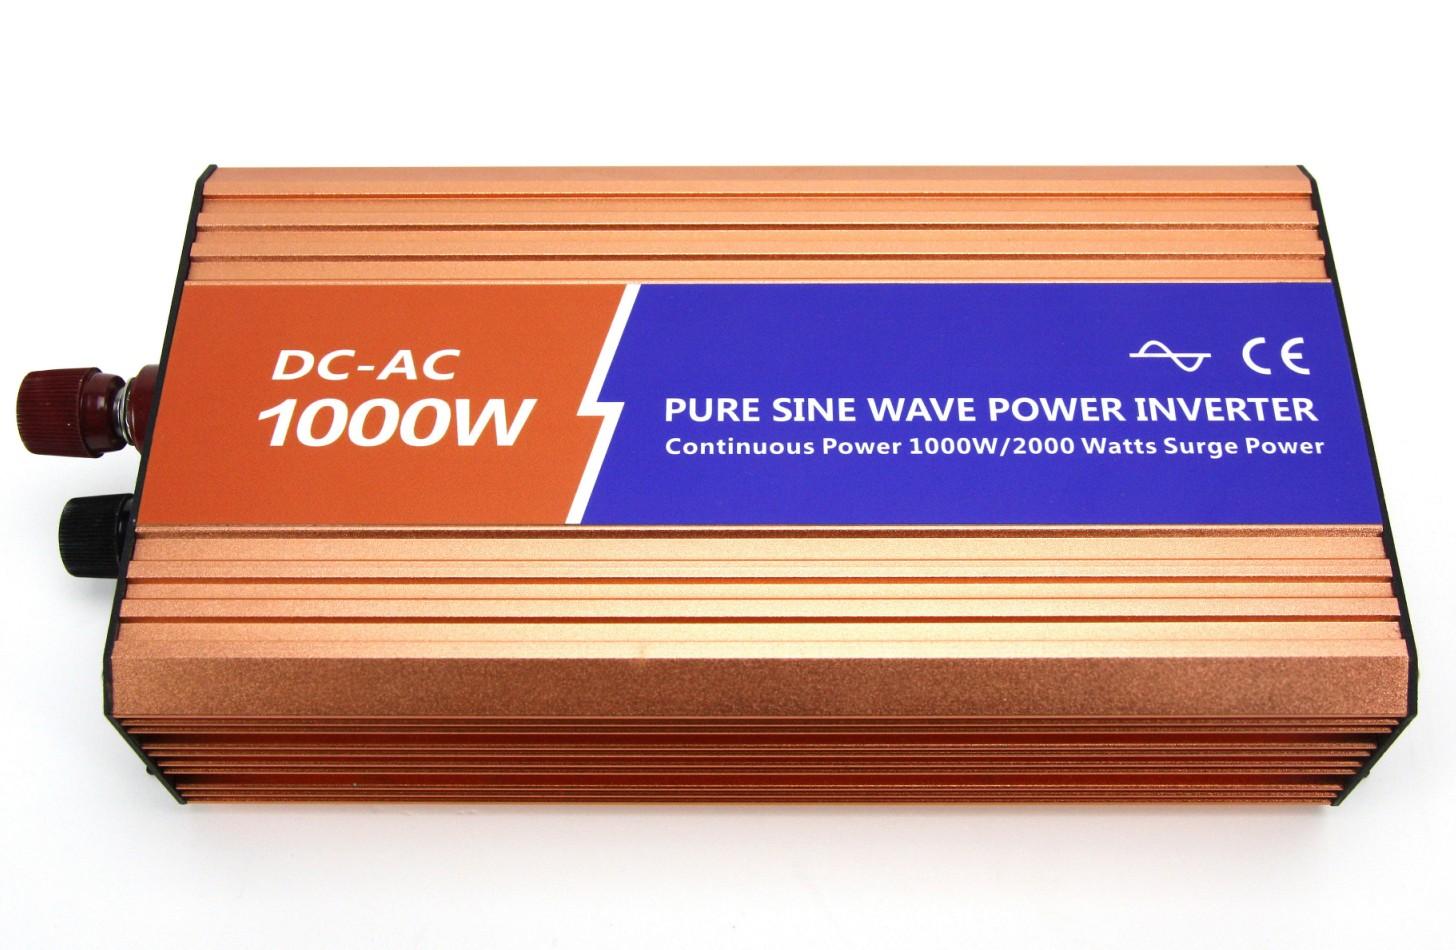 1000W纯正弦波高频大功率逆变器12V/24V/48V转220V1KW逆变器